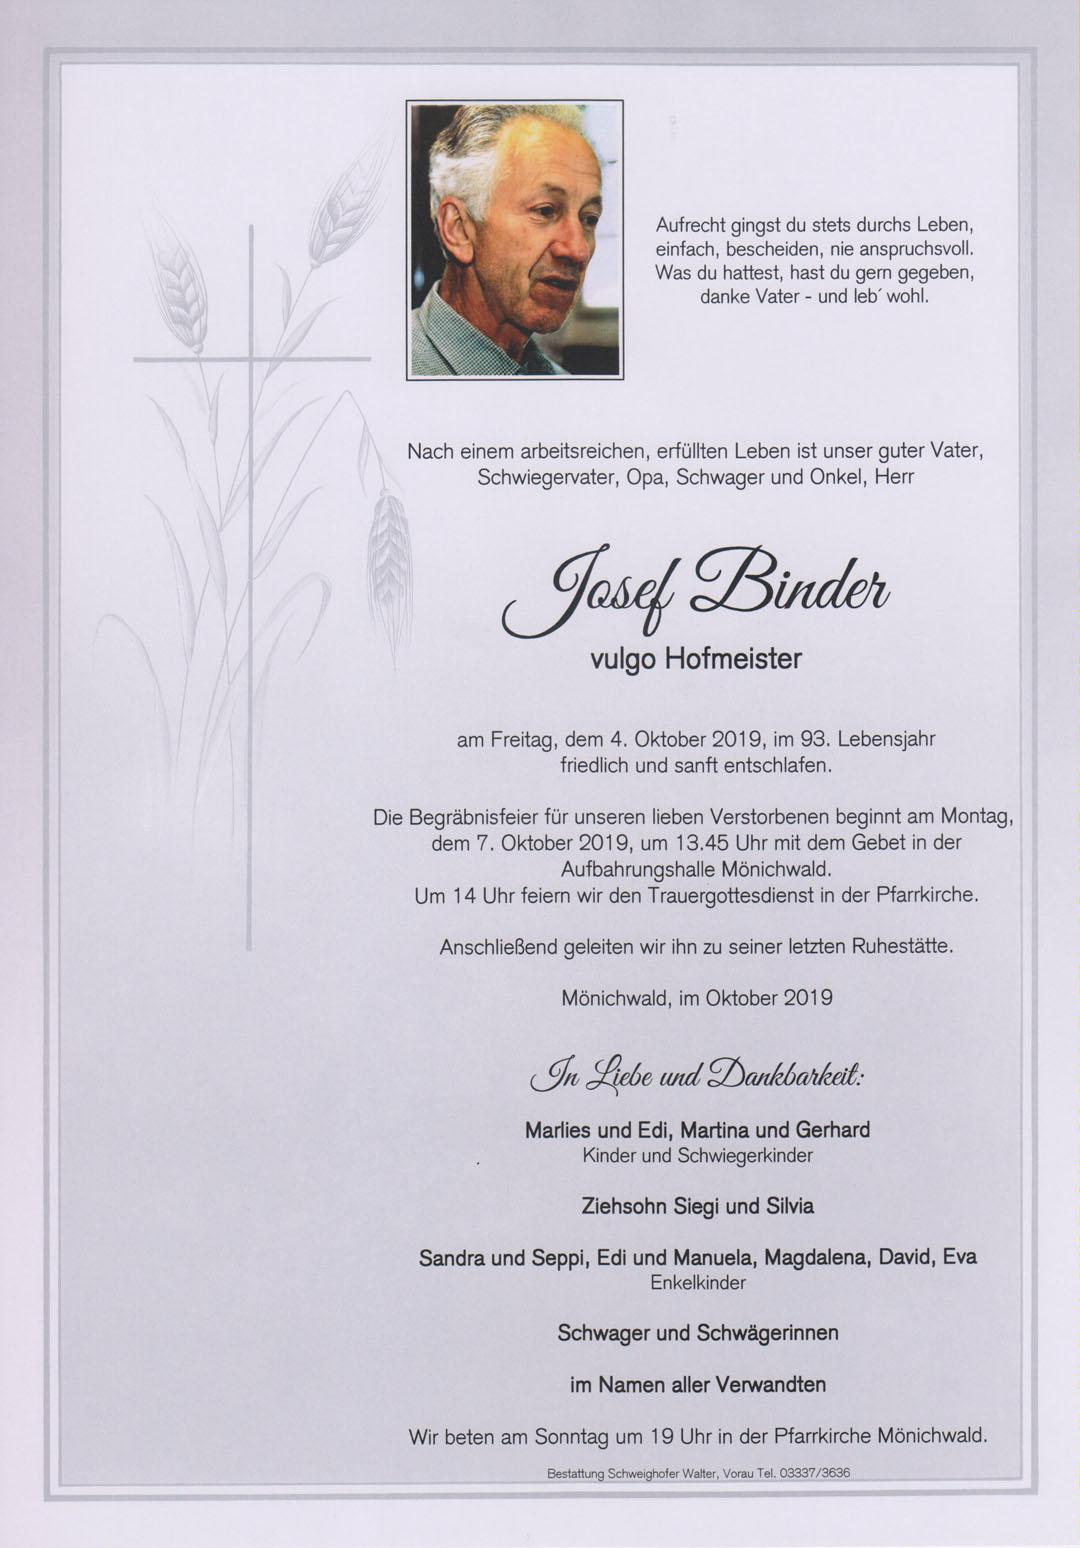 Josef Binder